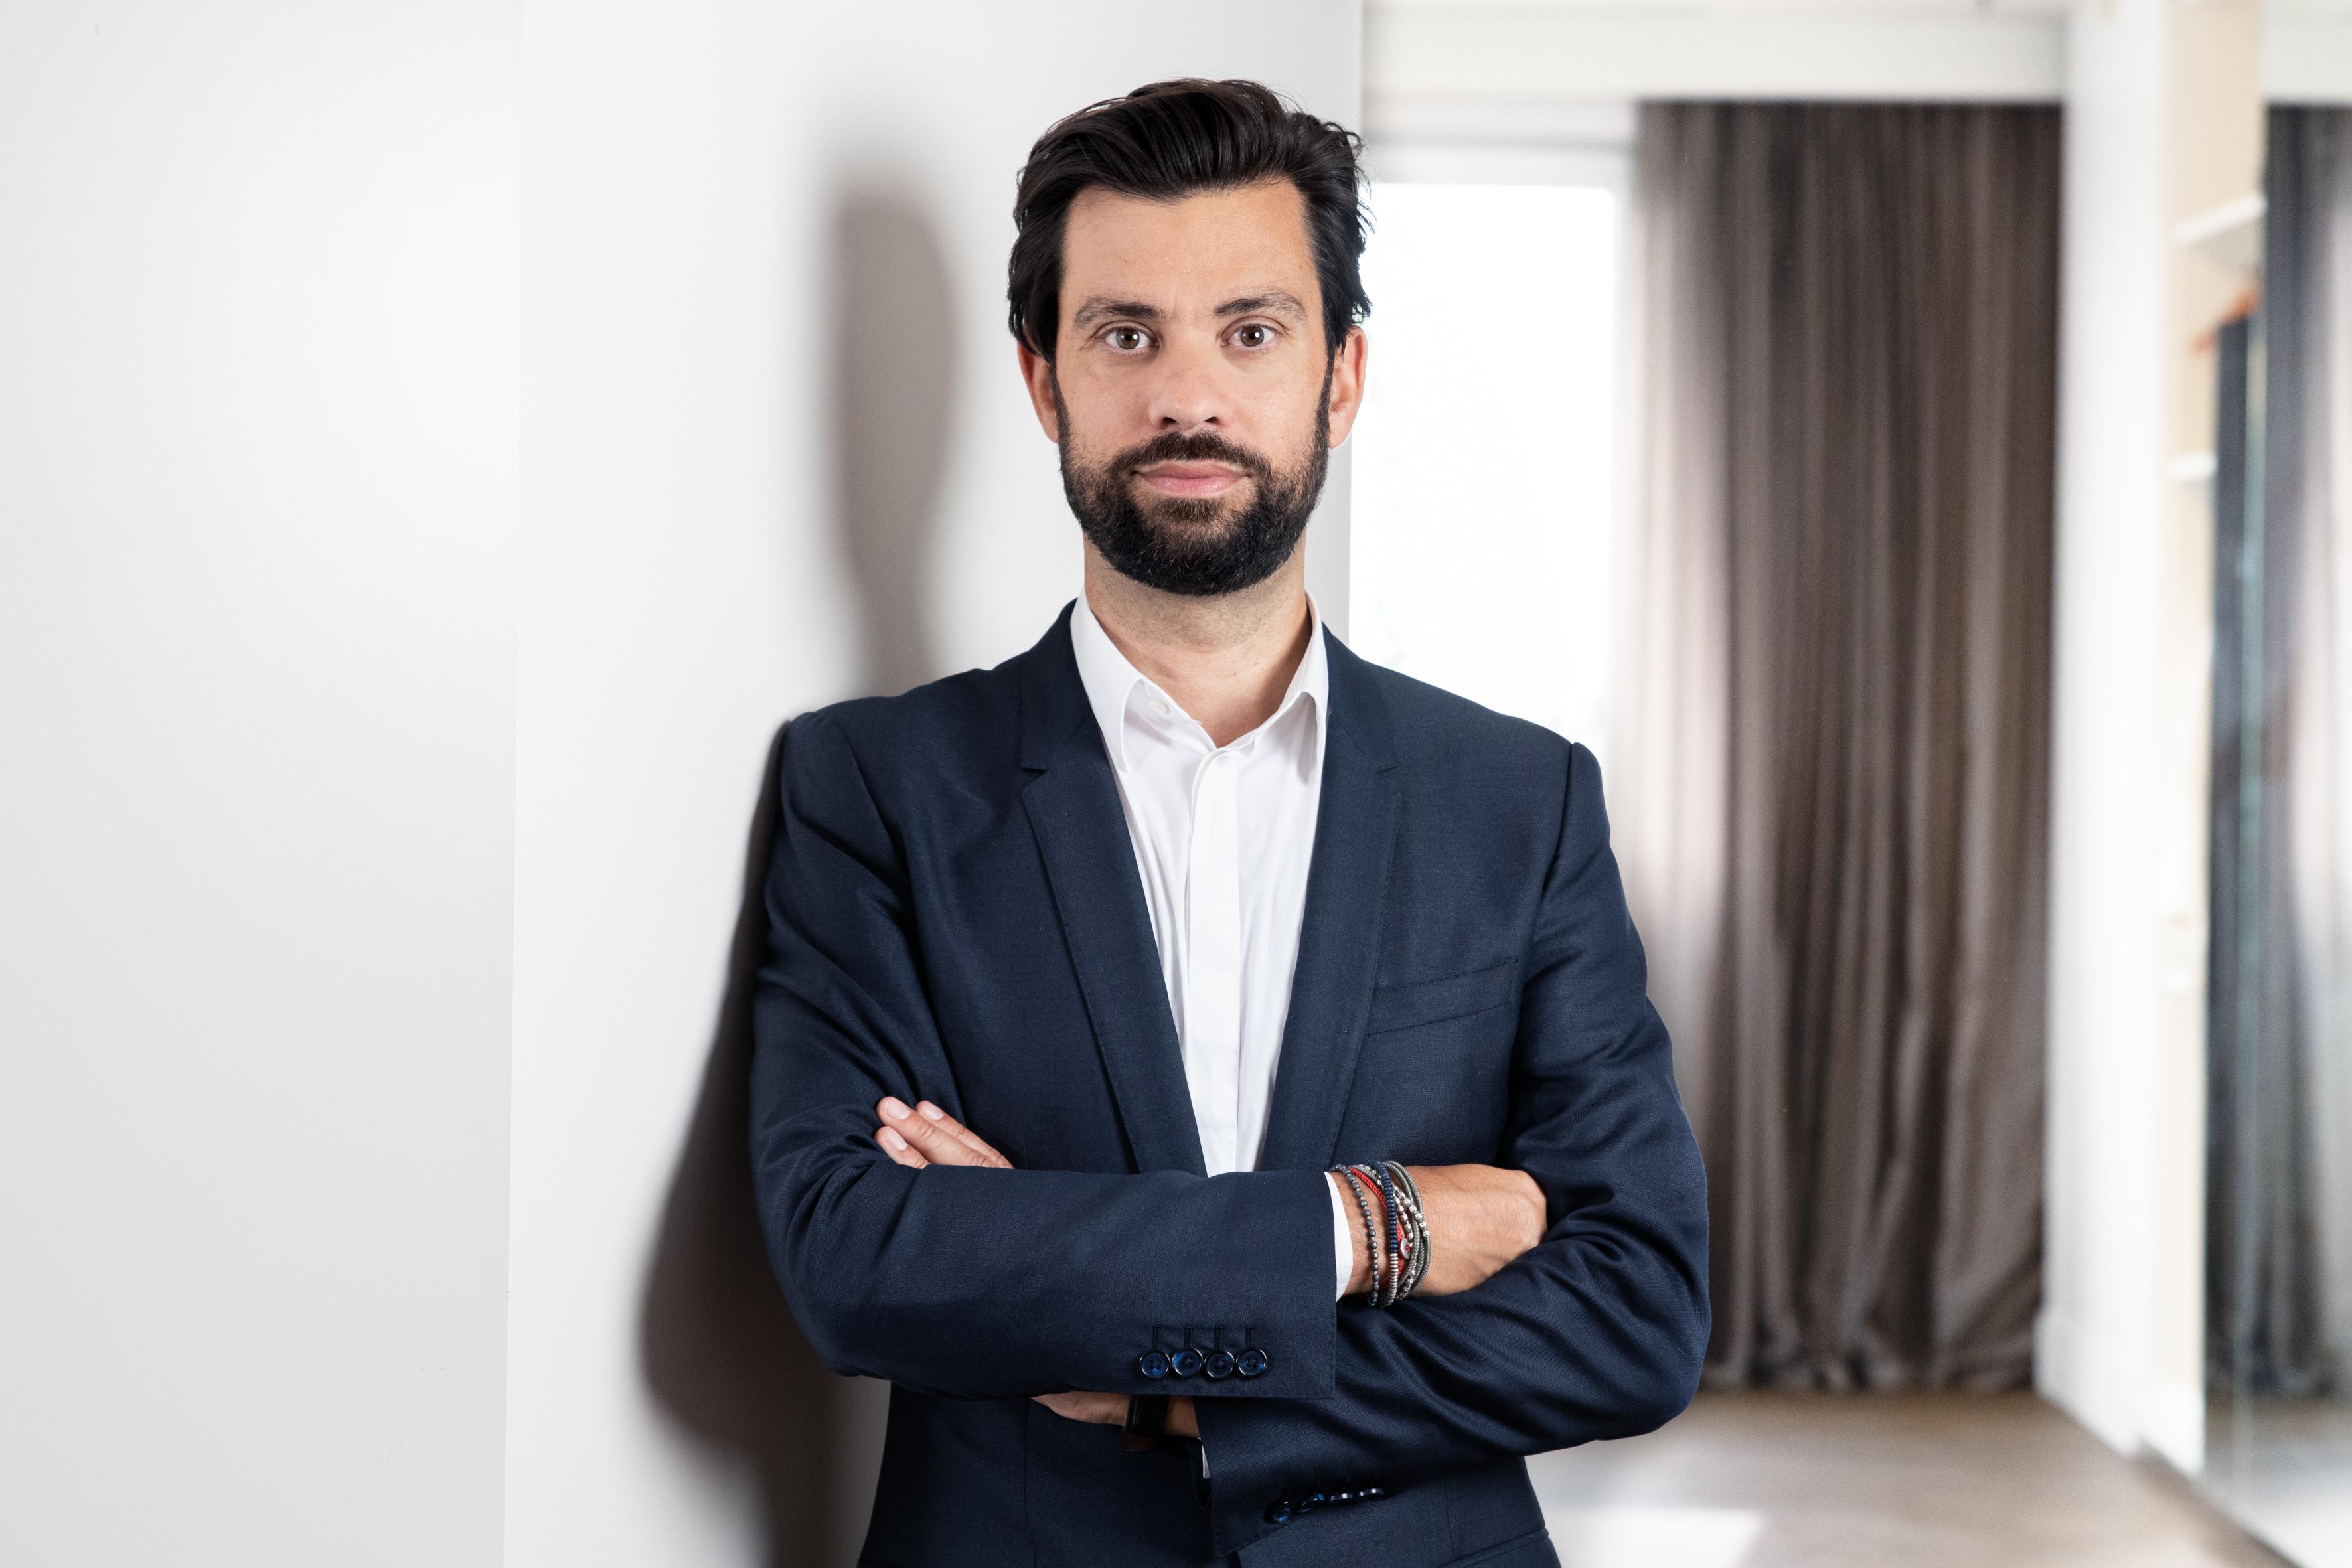 Galeries Lafayette Names Guillaume Gellusseau To Head Marketing Efforts